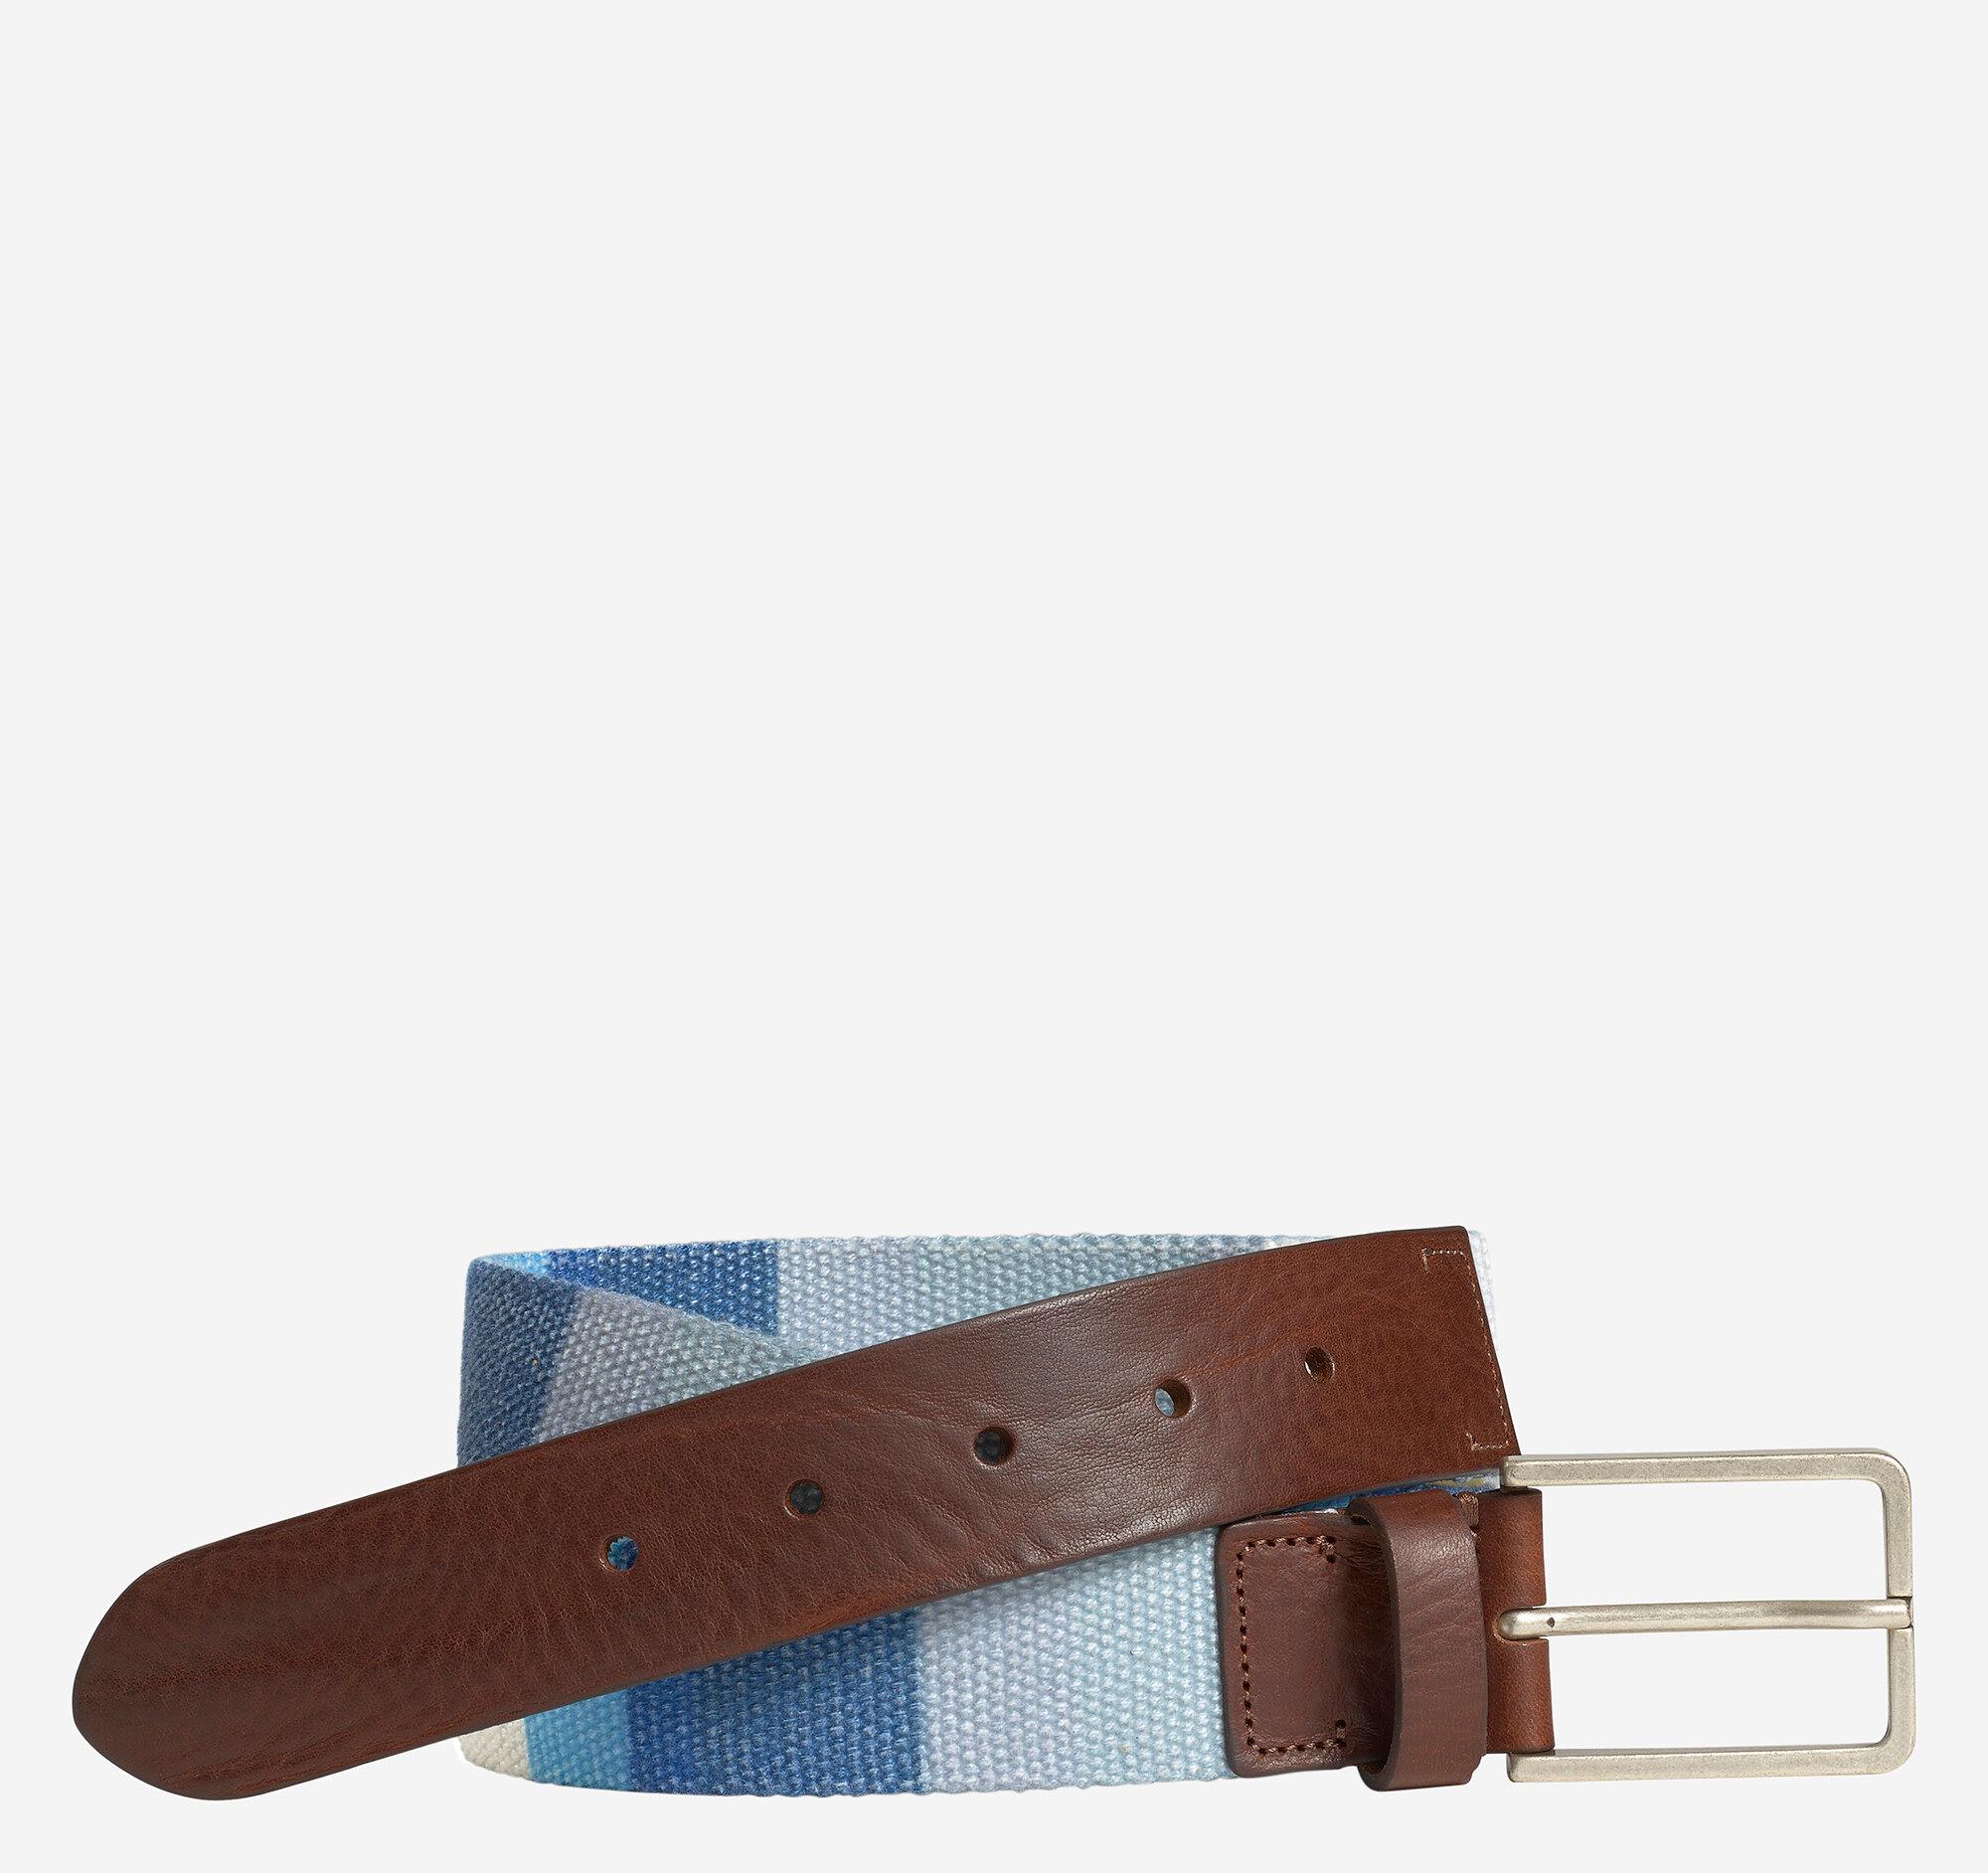 Johnston & Murphy Men's Multi-Color Cloth Belt - Blue Multi Cloth - Size 36